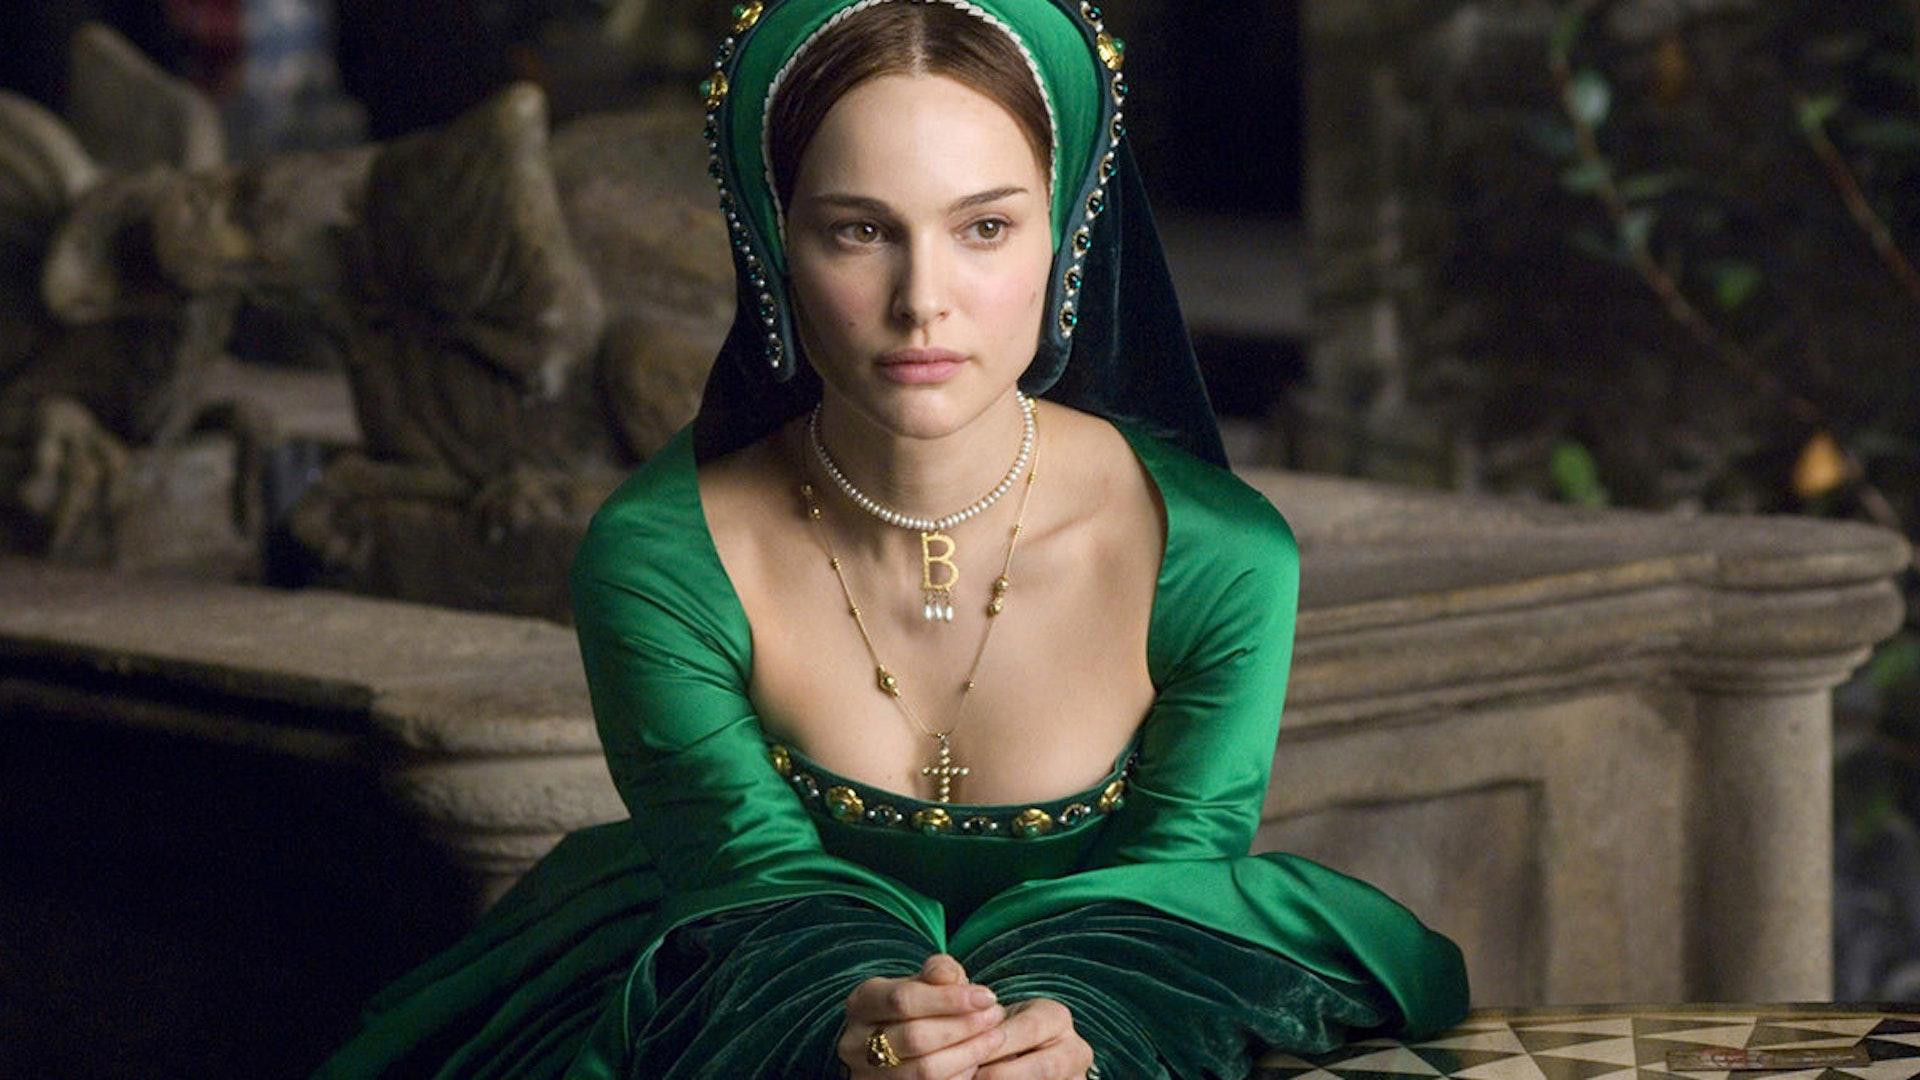 the-other-boleyn-girl-natalie-portman-1280x640